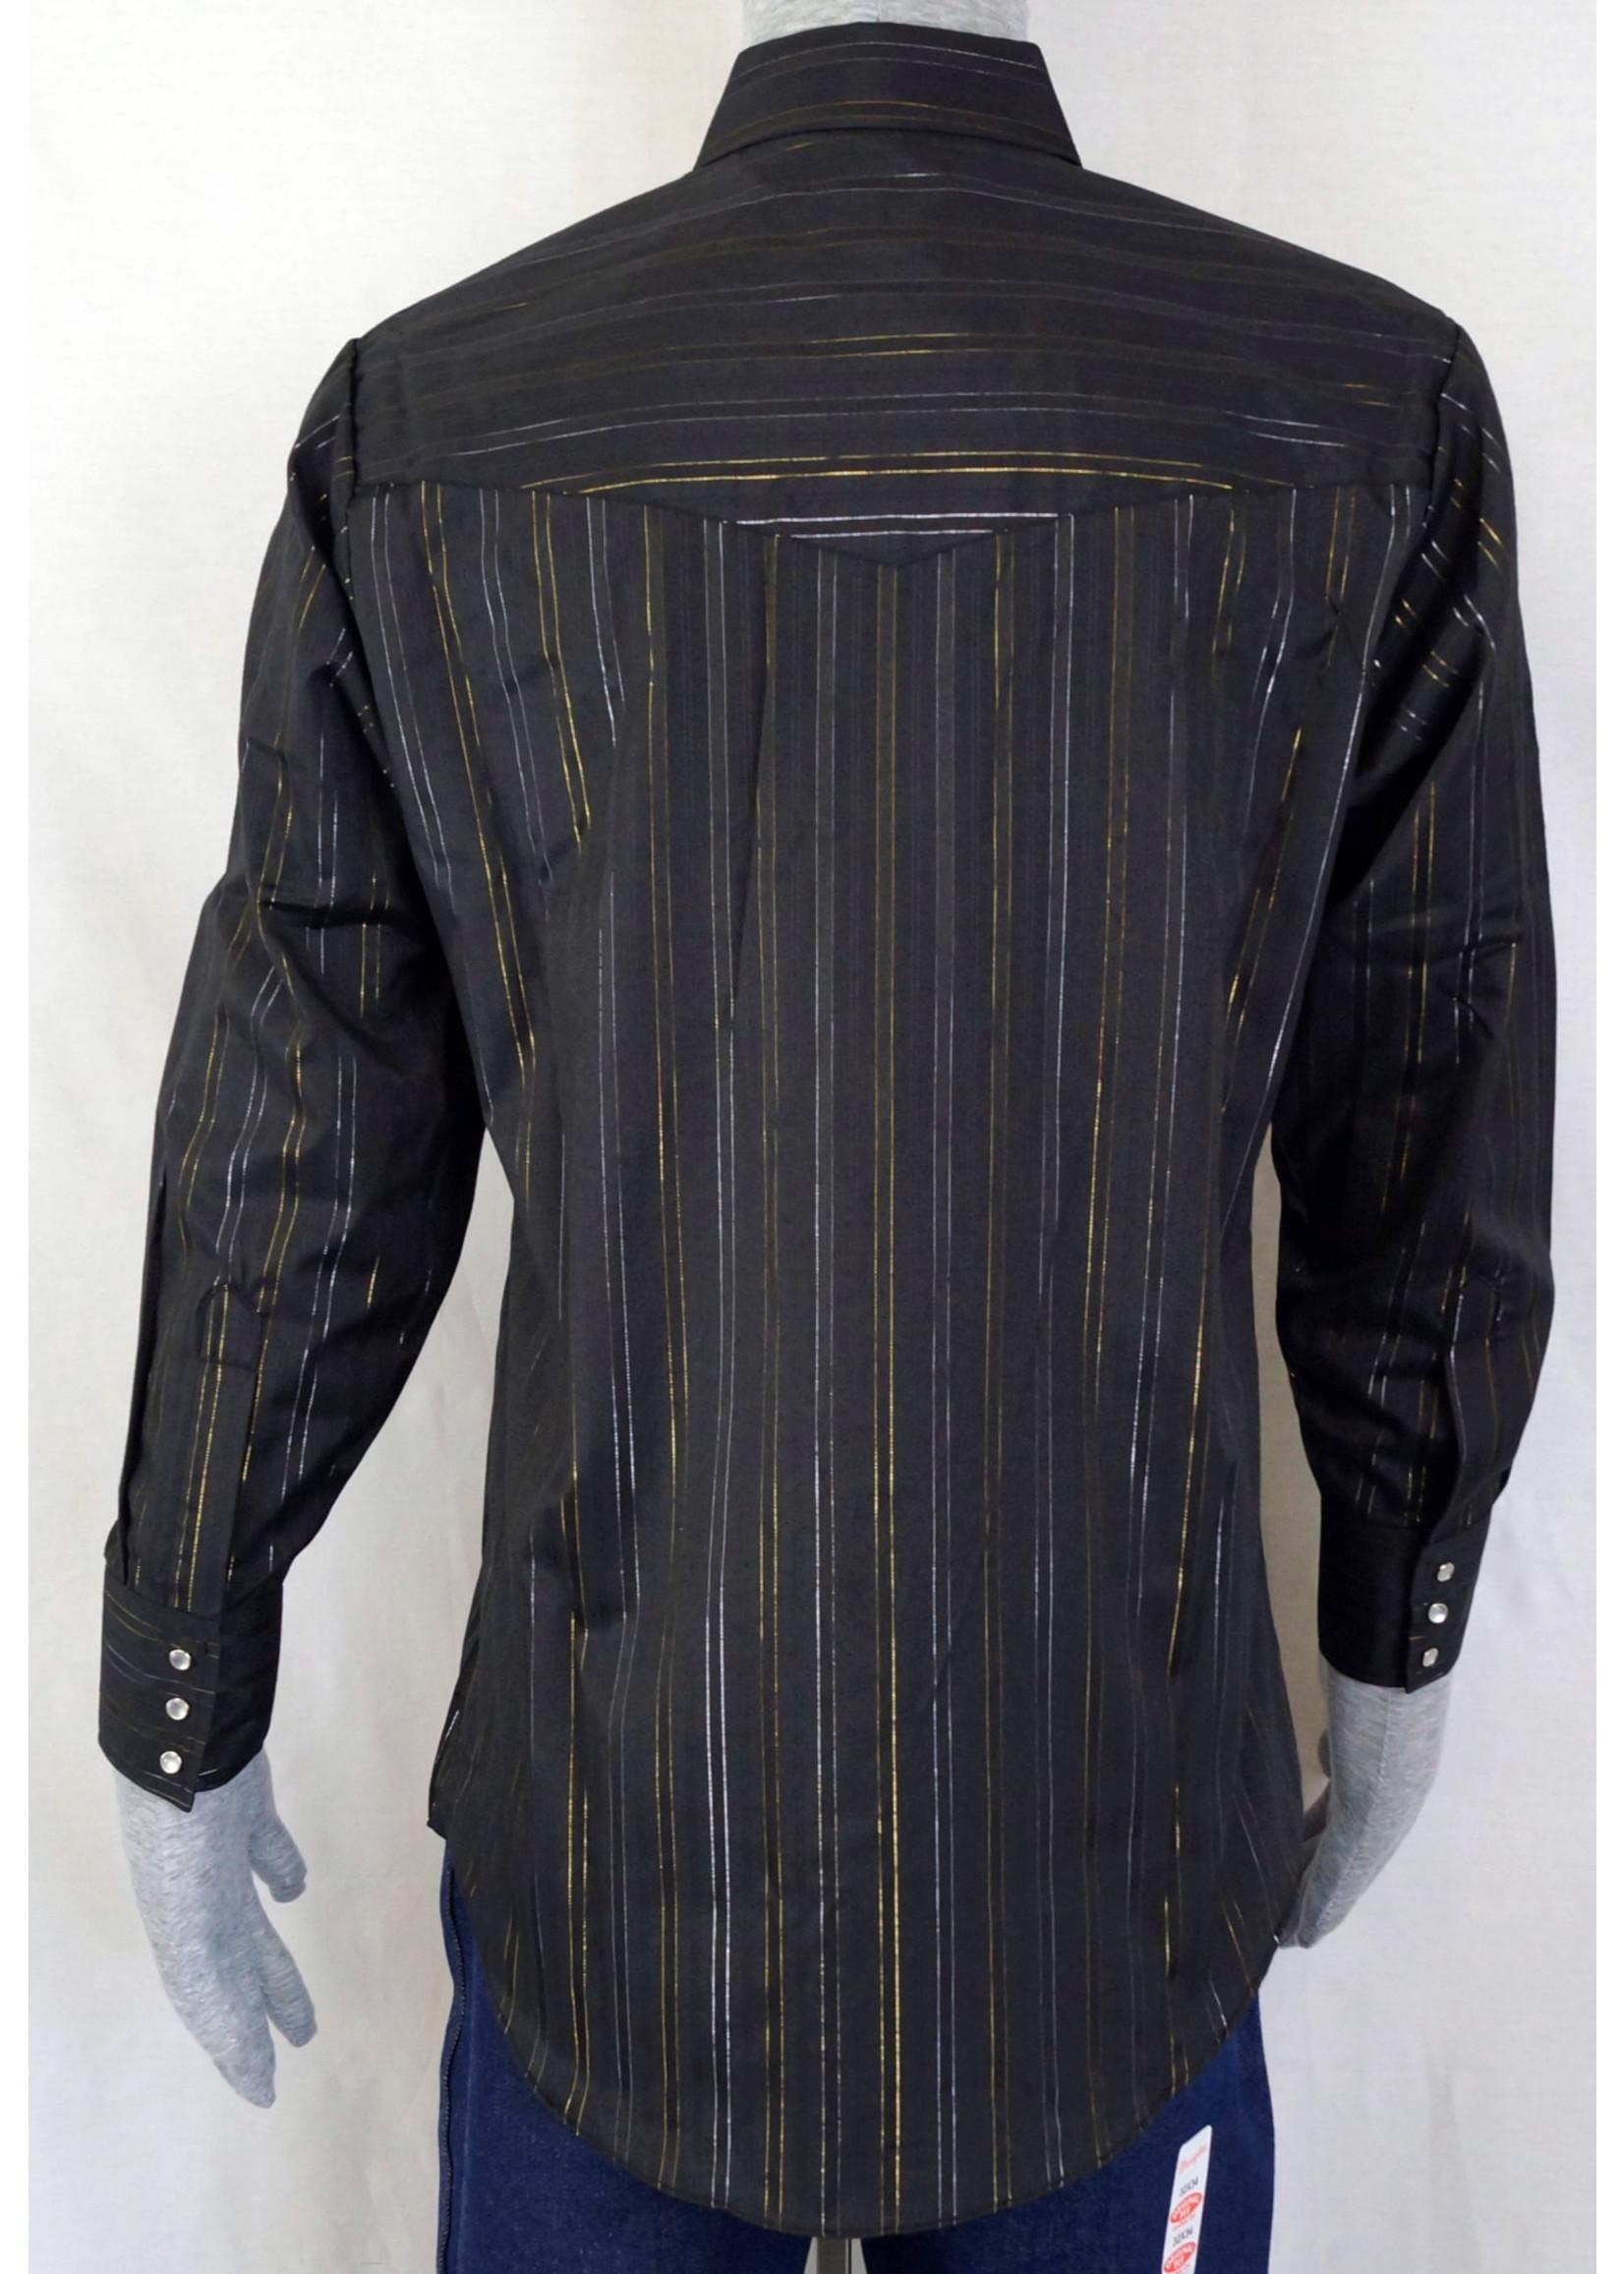 Ely Men's Black Long Sleeve Metallic Gold Western Shirt 15202944-89